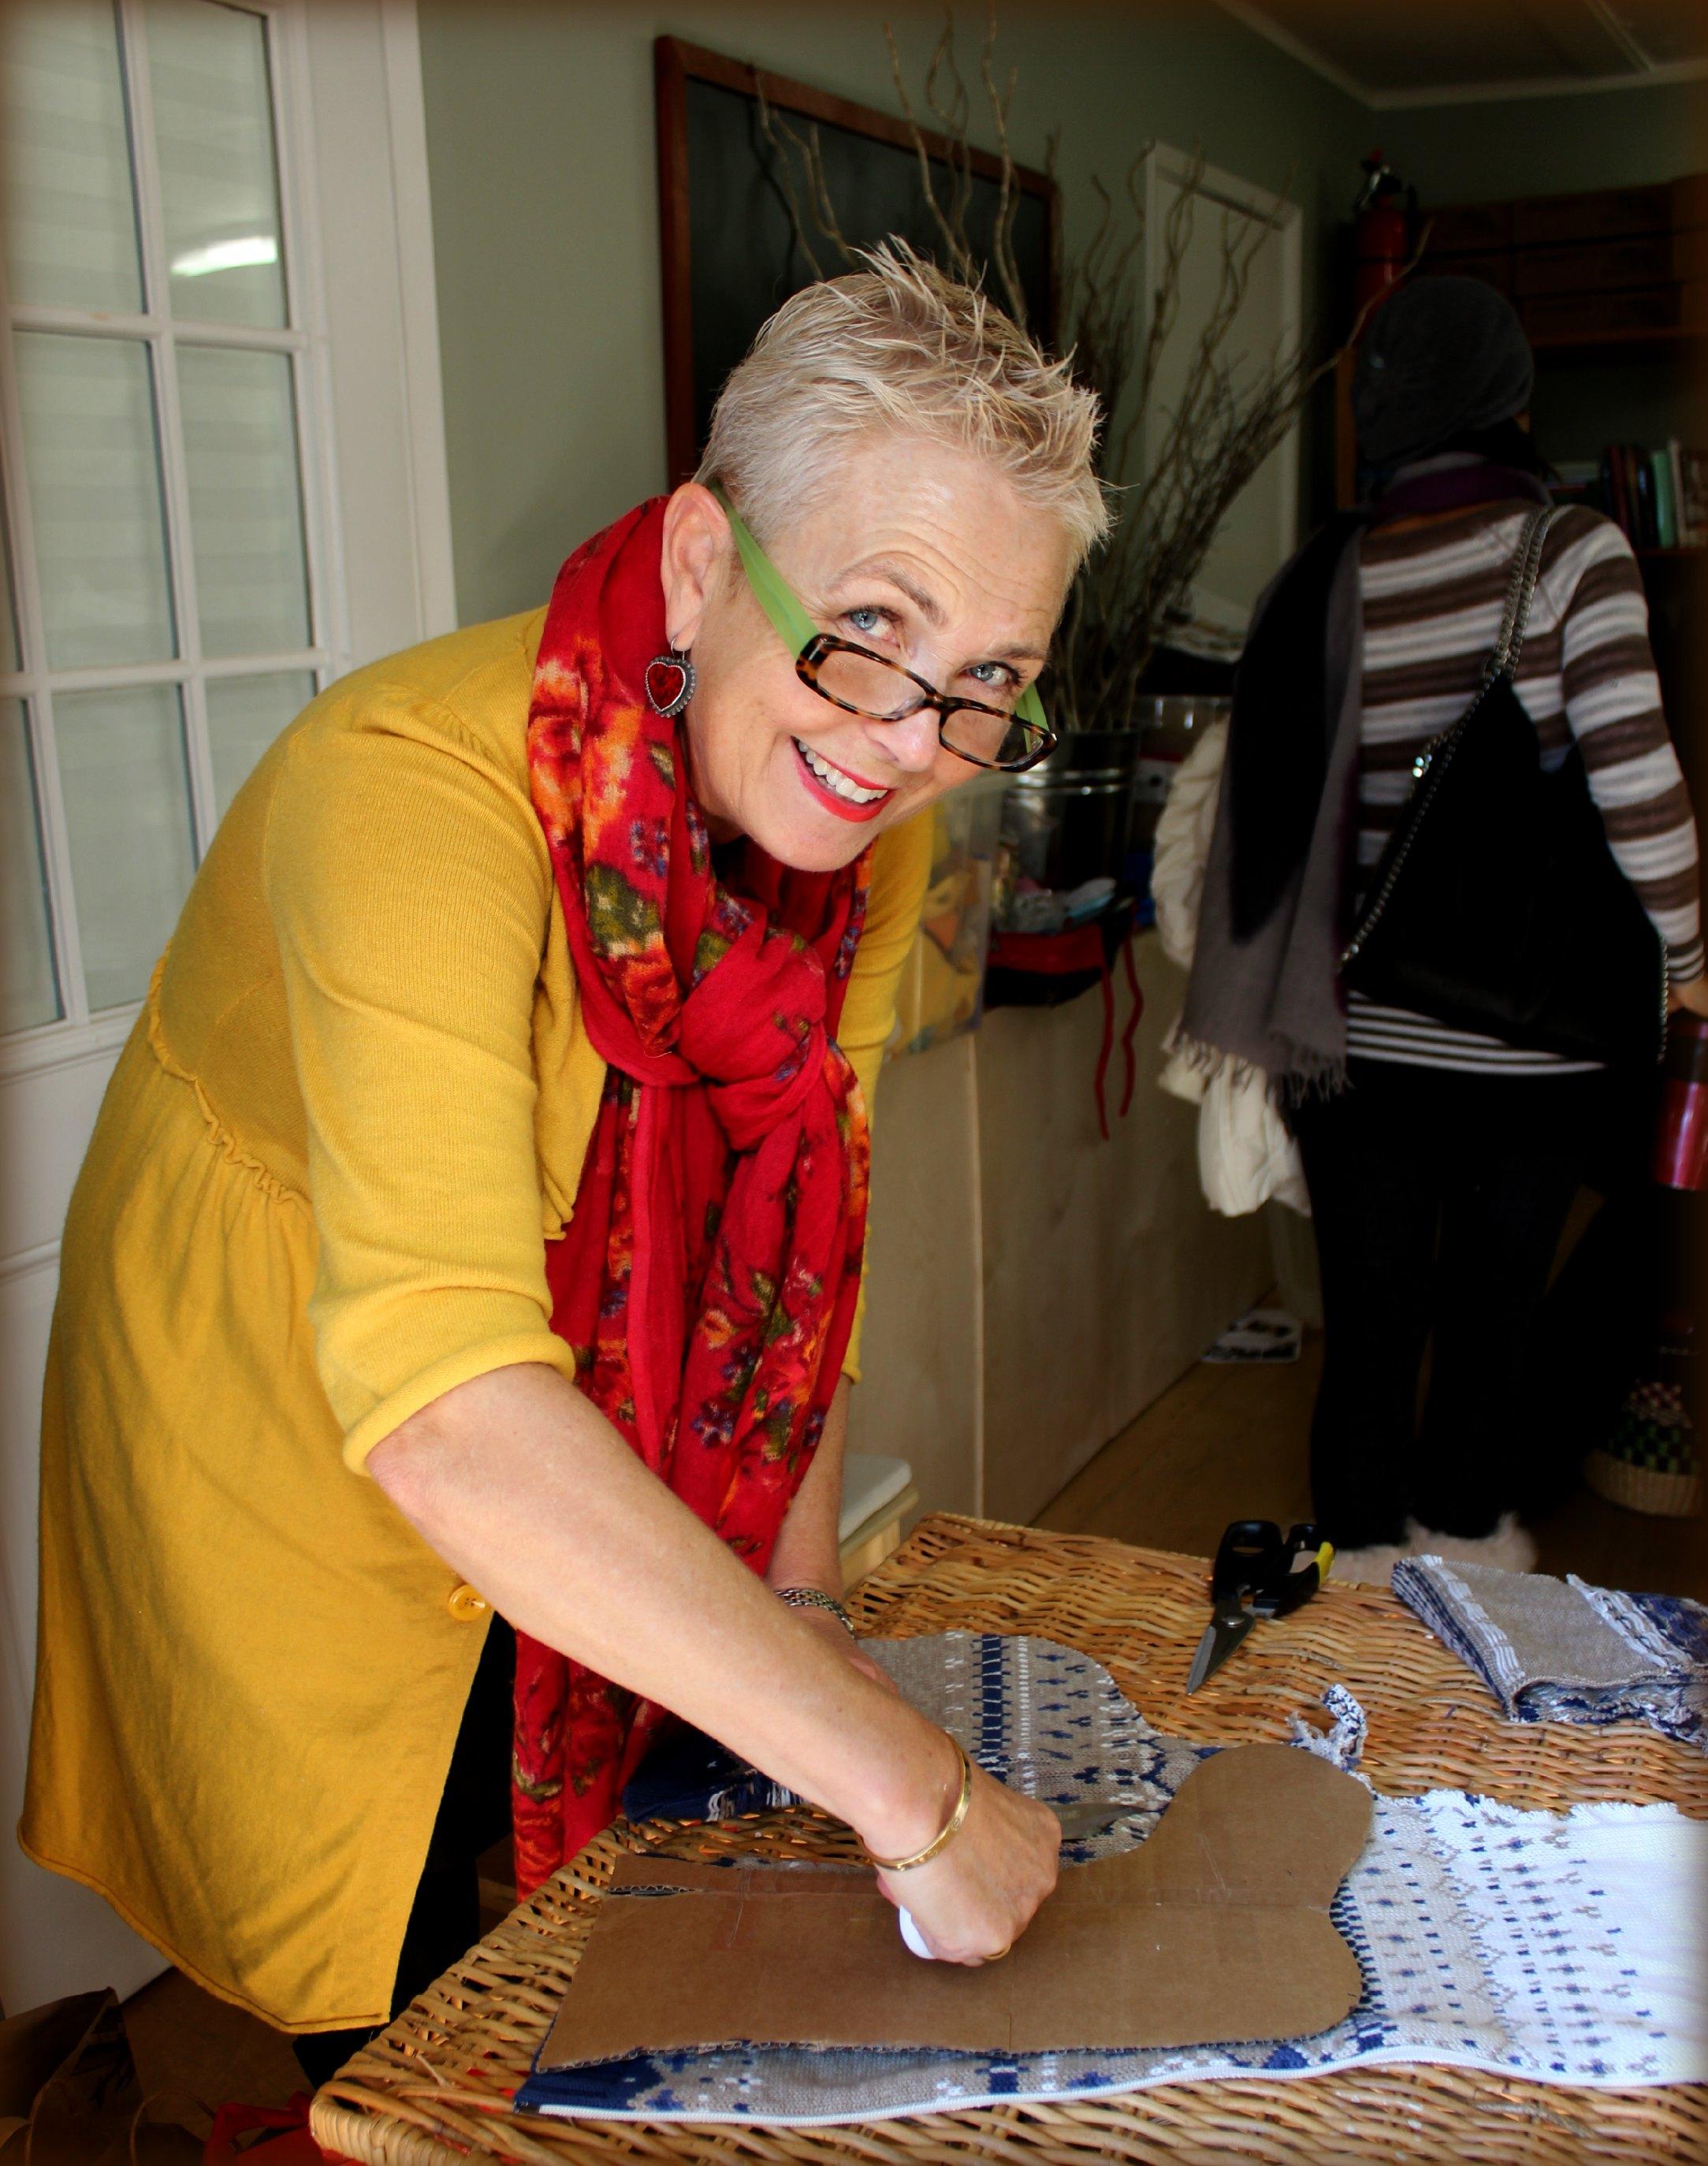 121219 Rachel cutting wool off a stocking template